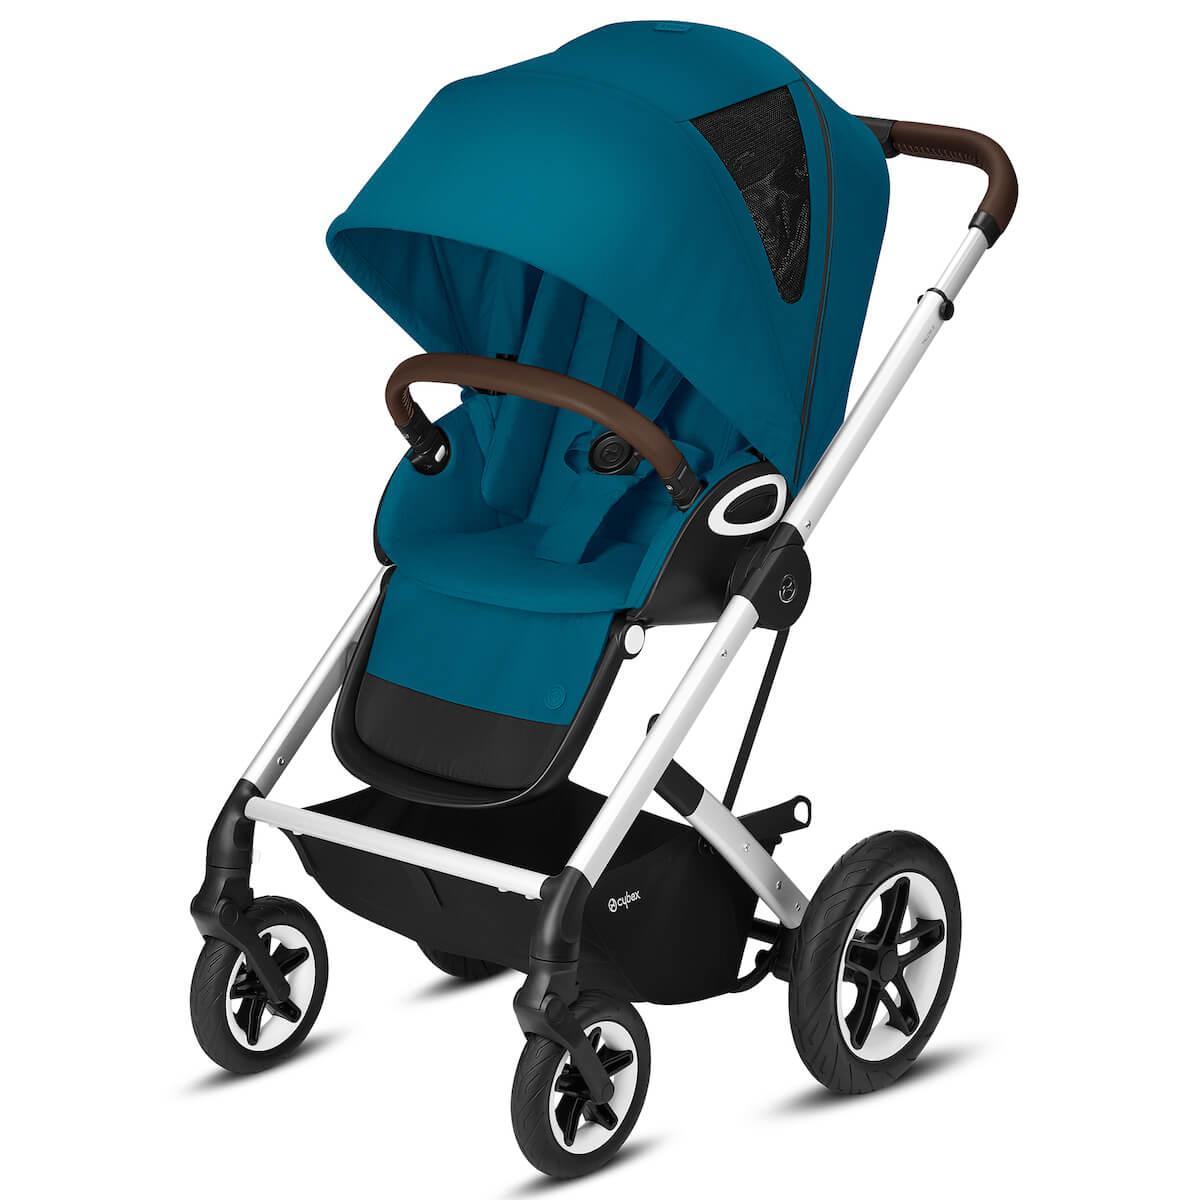 Kinderwagen TALOS S LUX SLV Cybex River blue-turquoise